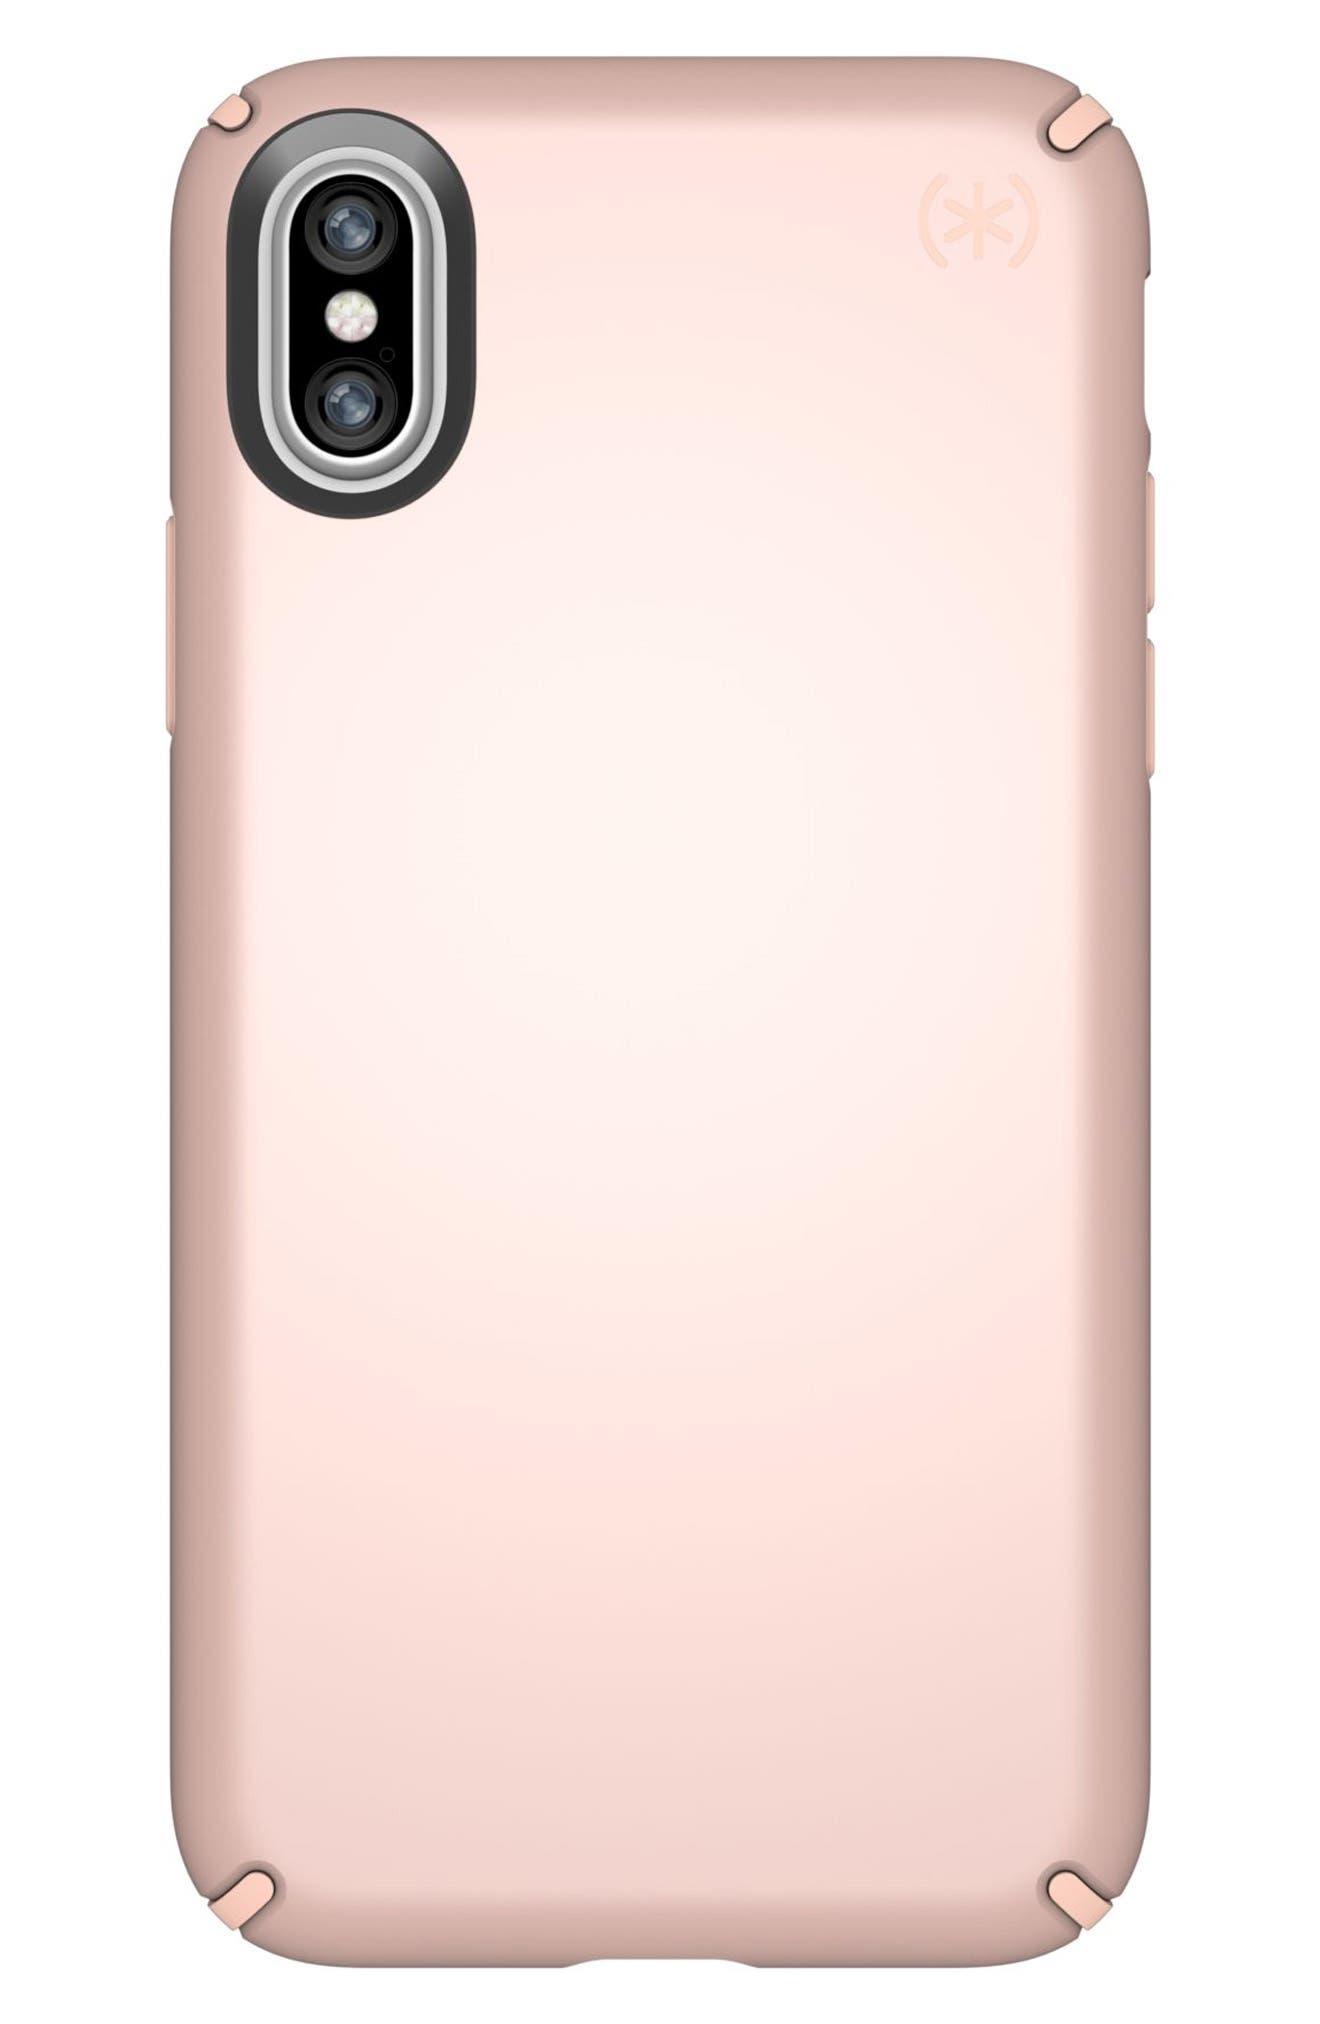 iPhone X Case,                             Main thumbnail 1, color,                             Rose Gold Metallic/ Peach